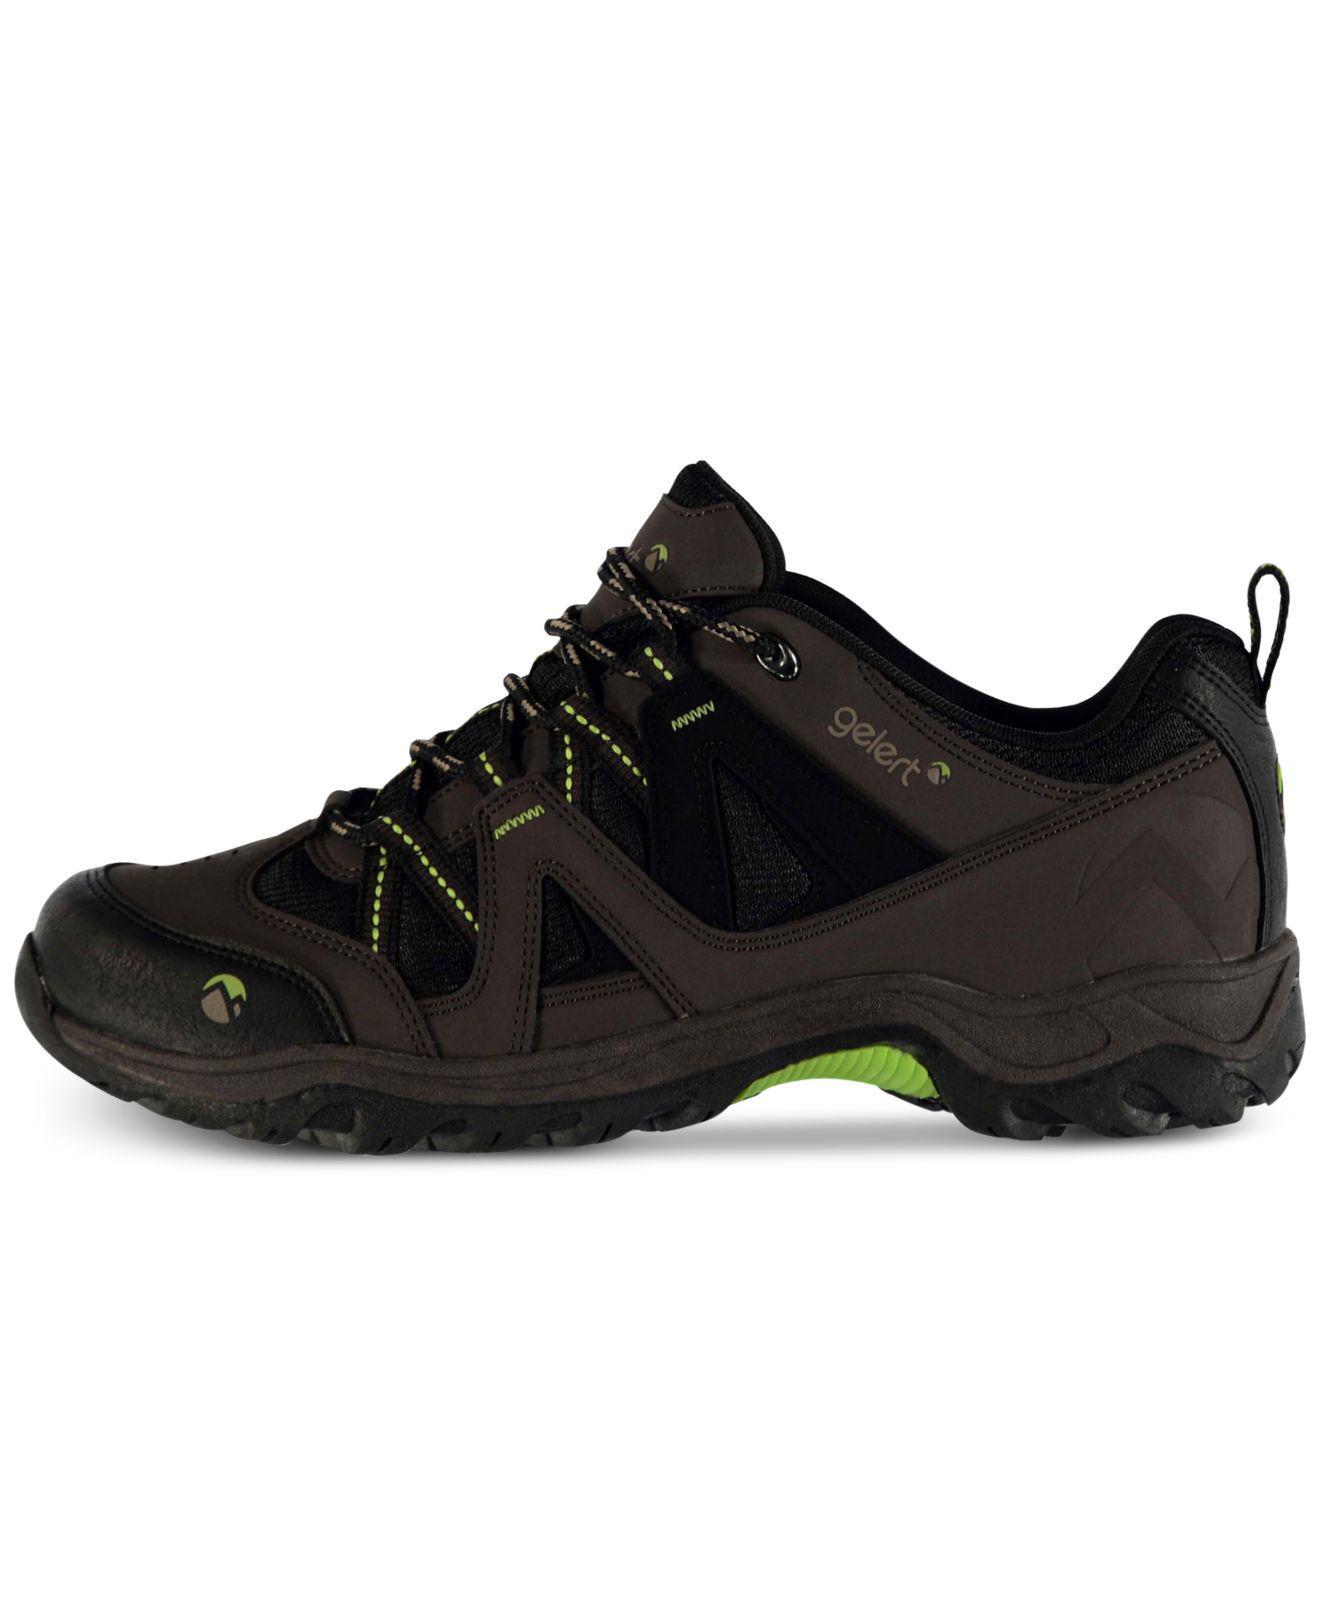 Black Diamond Men's Ottawa Low Hiking Shoes from Eastern Mountain Sports kyoV4u